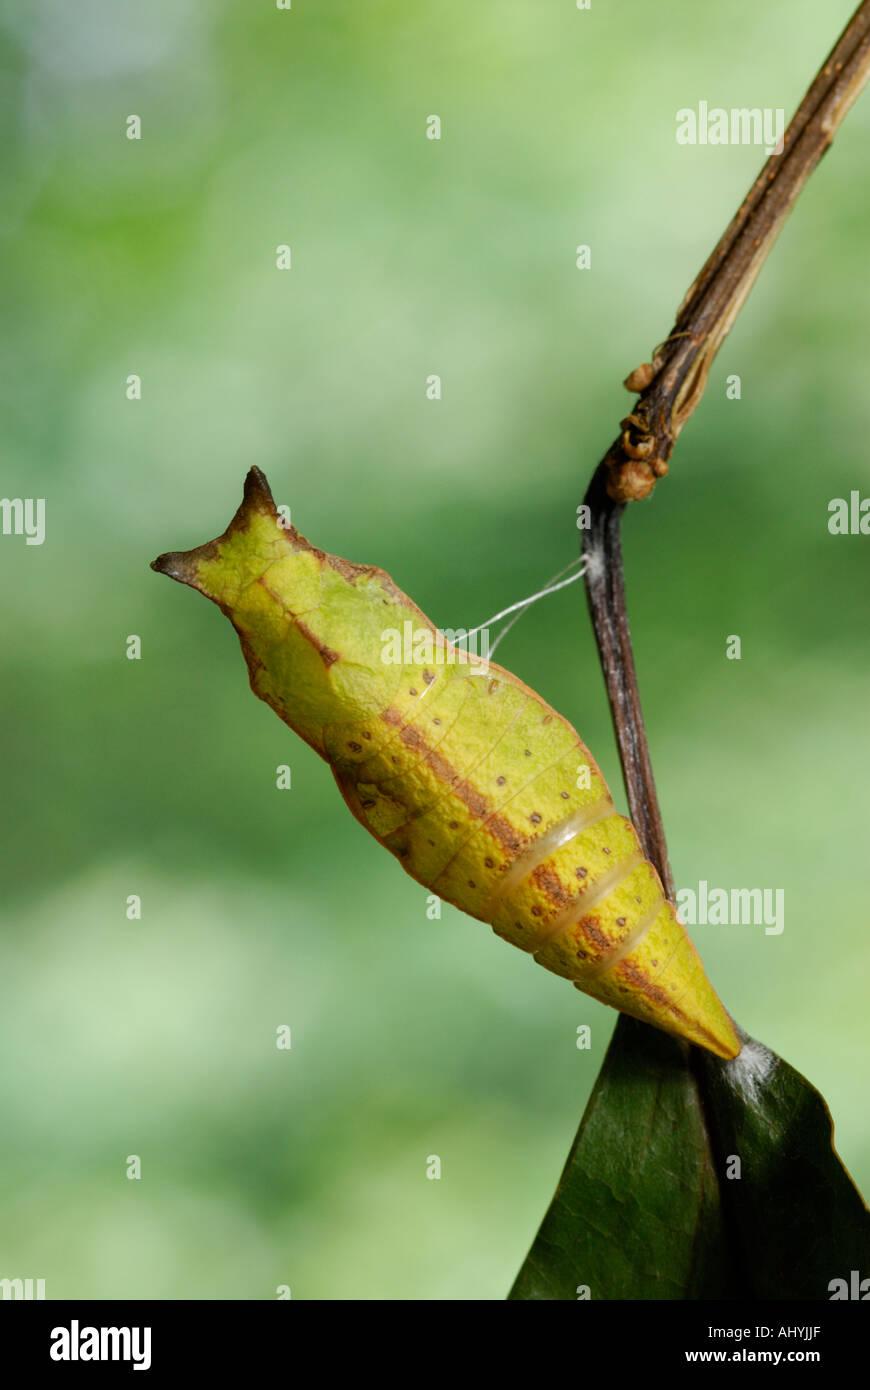 Spicebush swallowtail, Papilio troilus, chrysalis pupa - Stock Image